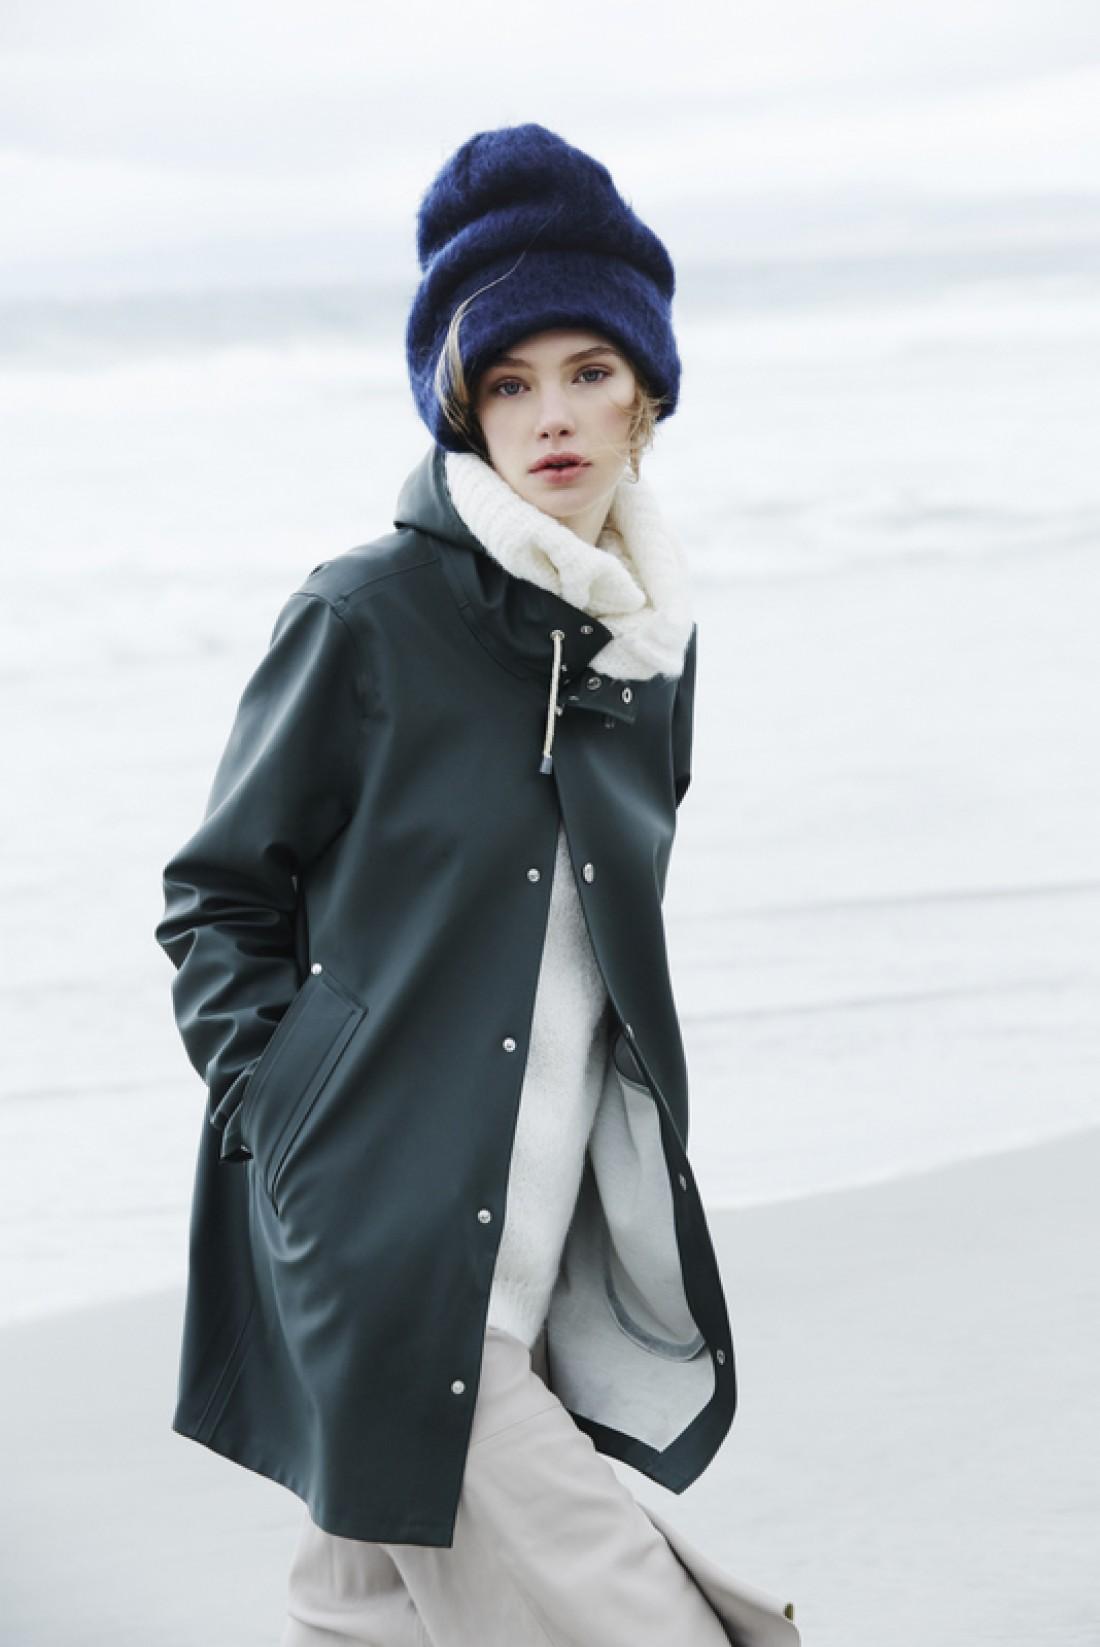 Marnie for Fashion Quarterly, shot by Mara Sommer